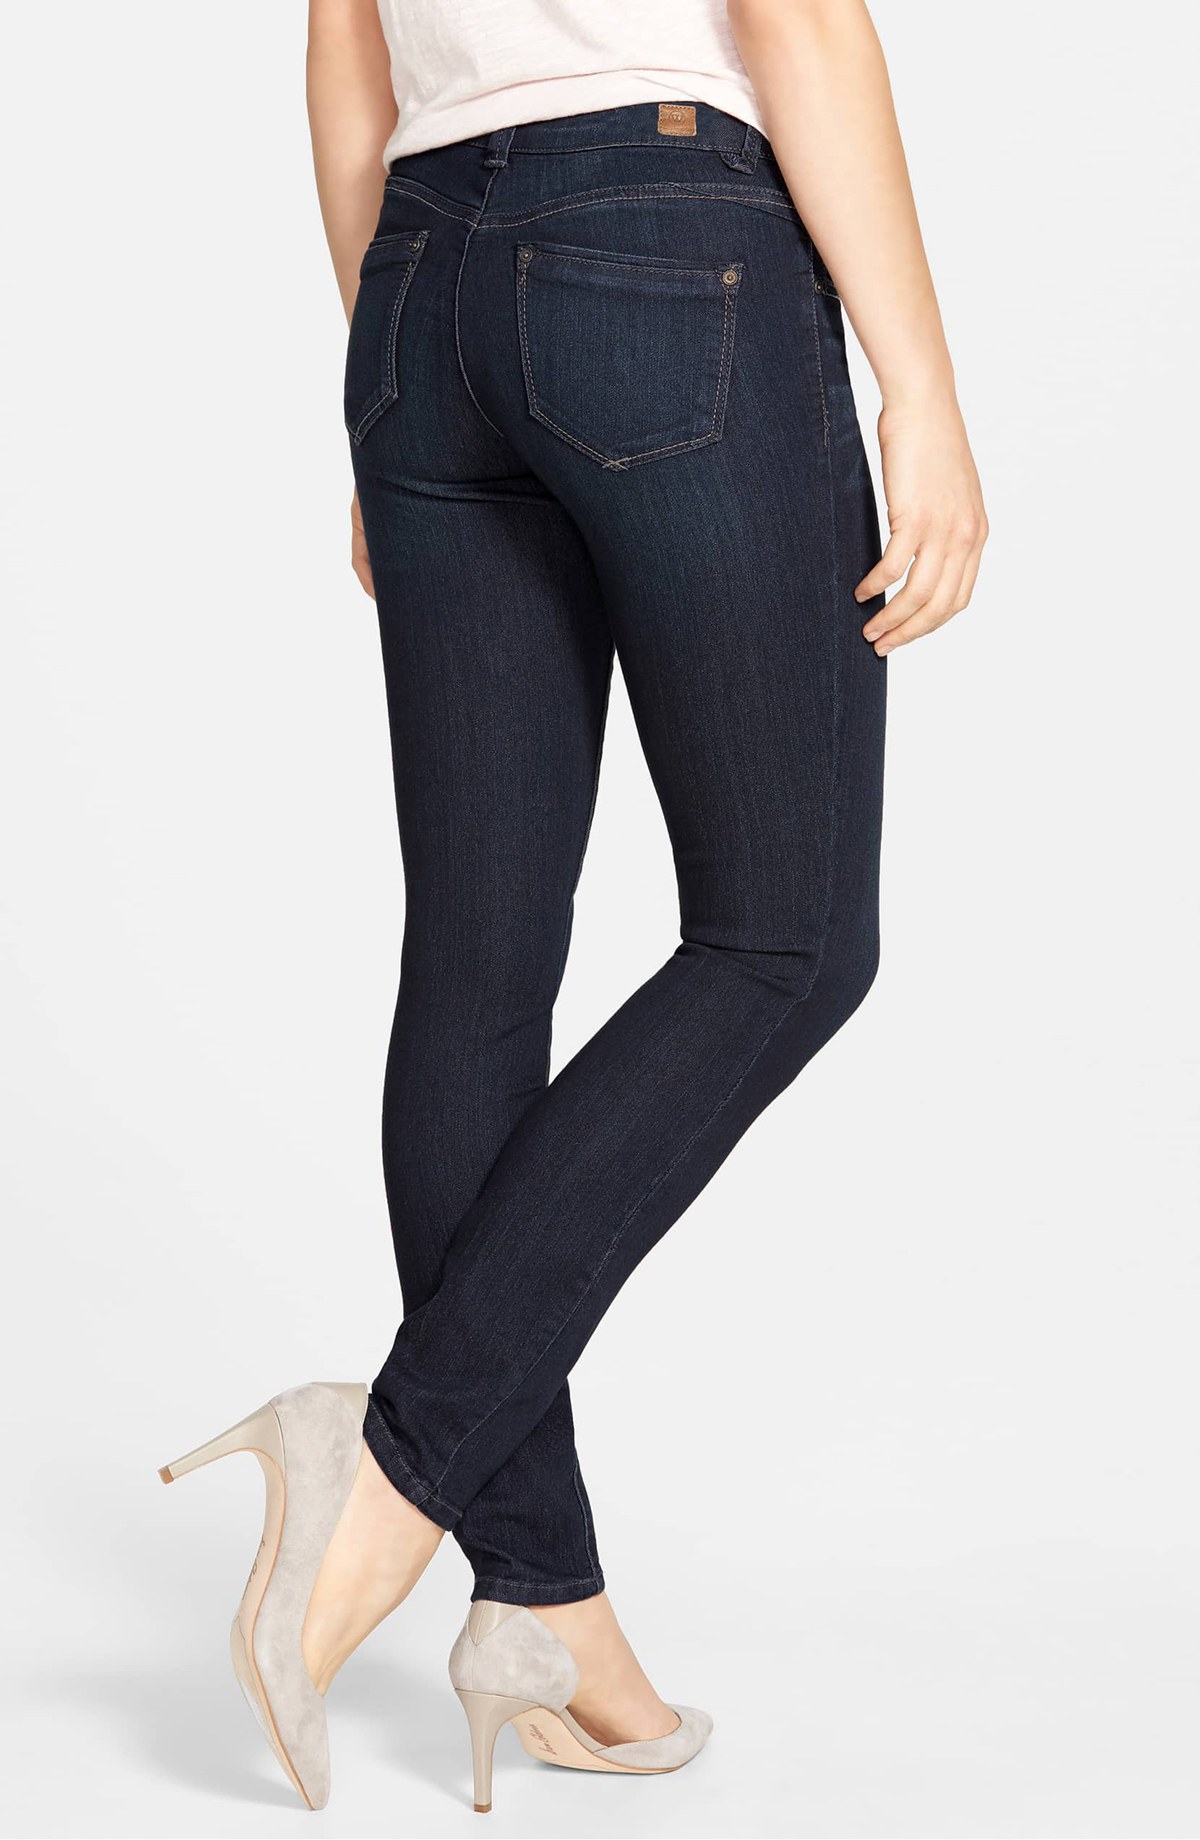 WW Jeans Back